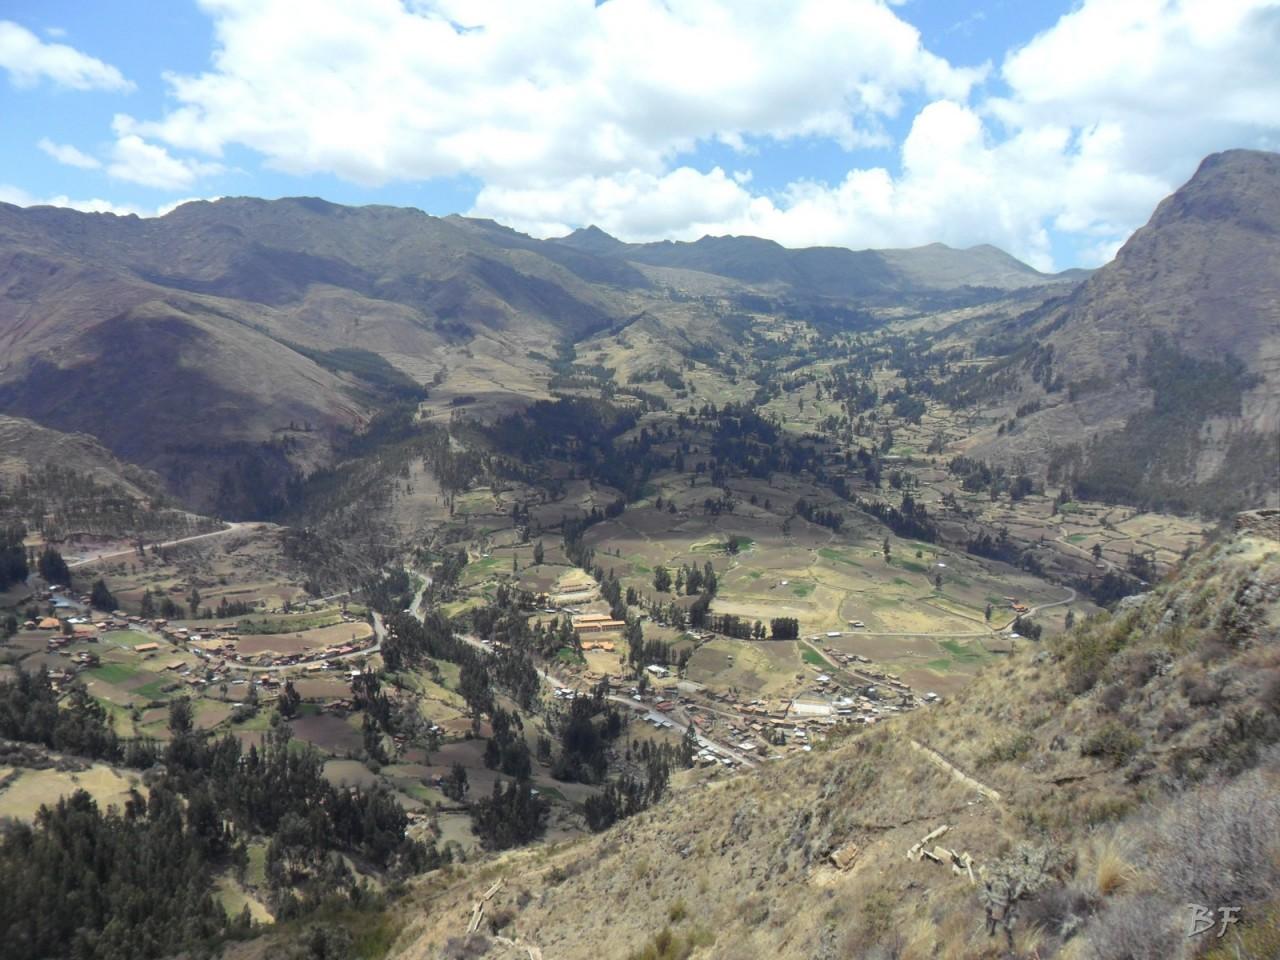 Mura-Poligonali-Megaliti-Altari-Rupestri-Pisac-Cusco-Perù-4